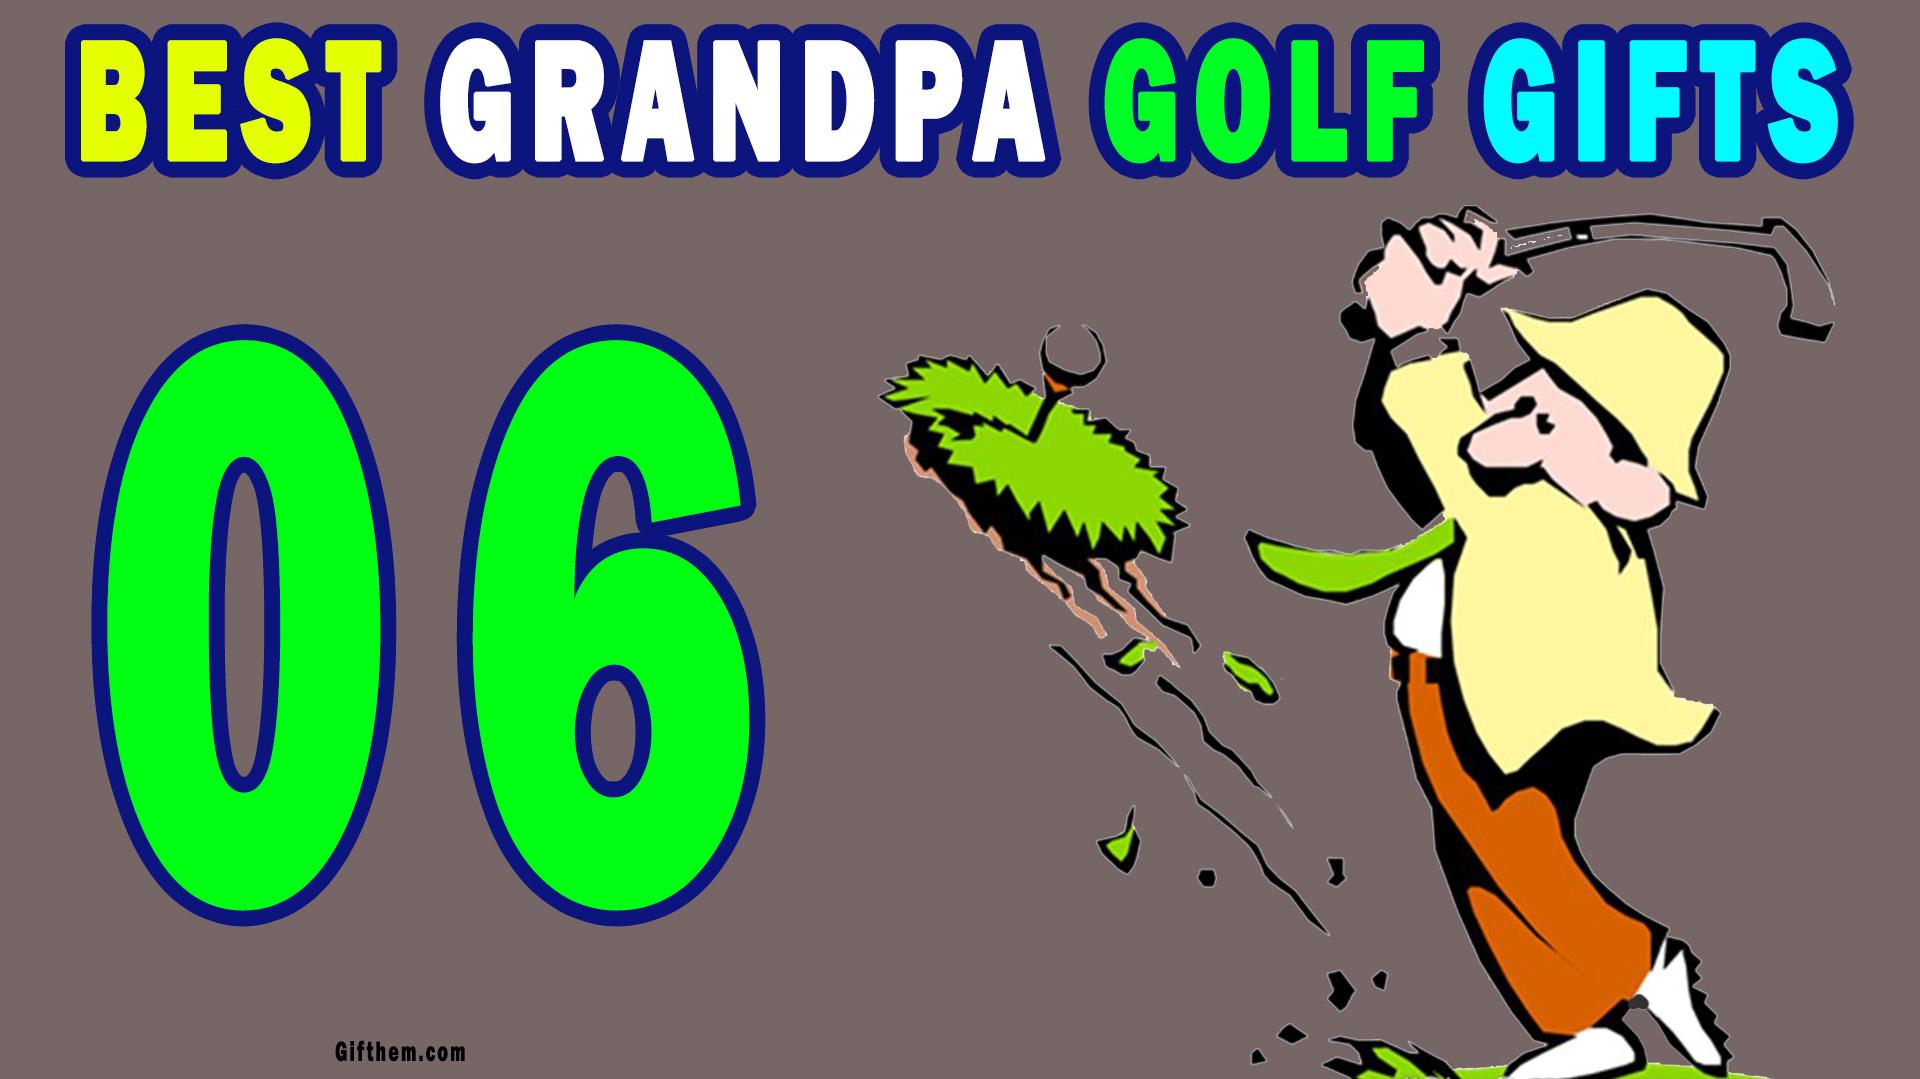 Grandpa Golf Gifts